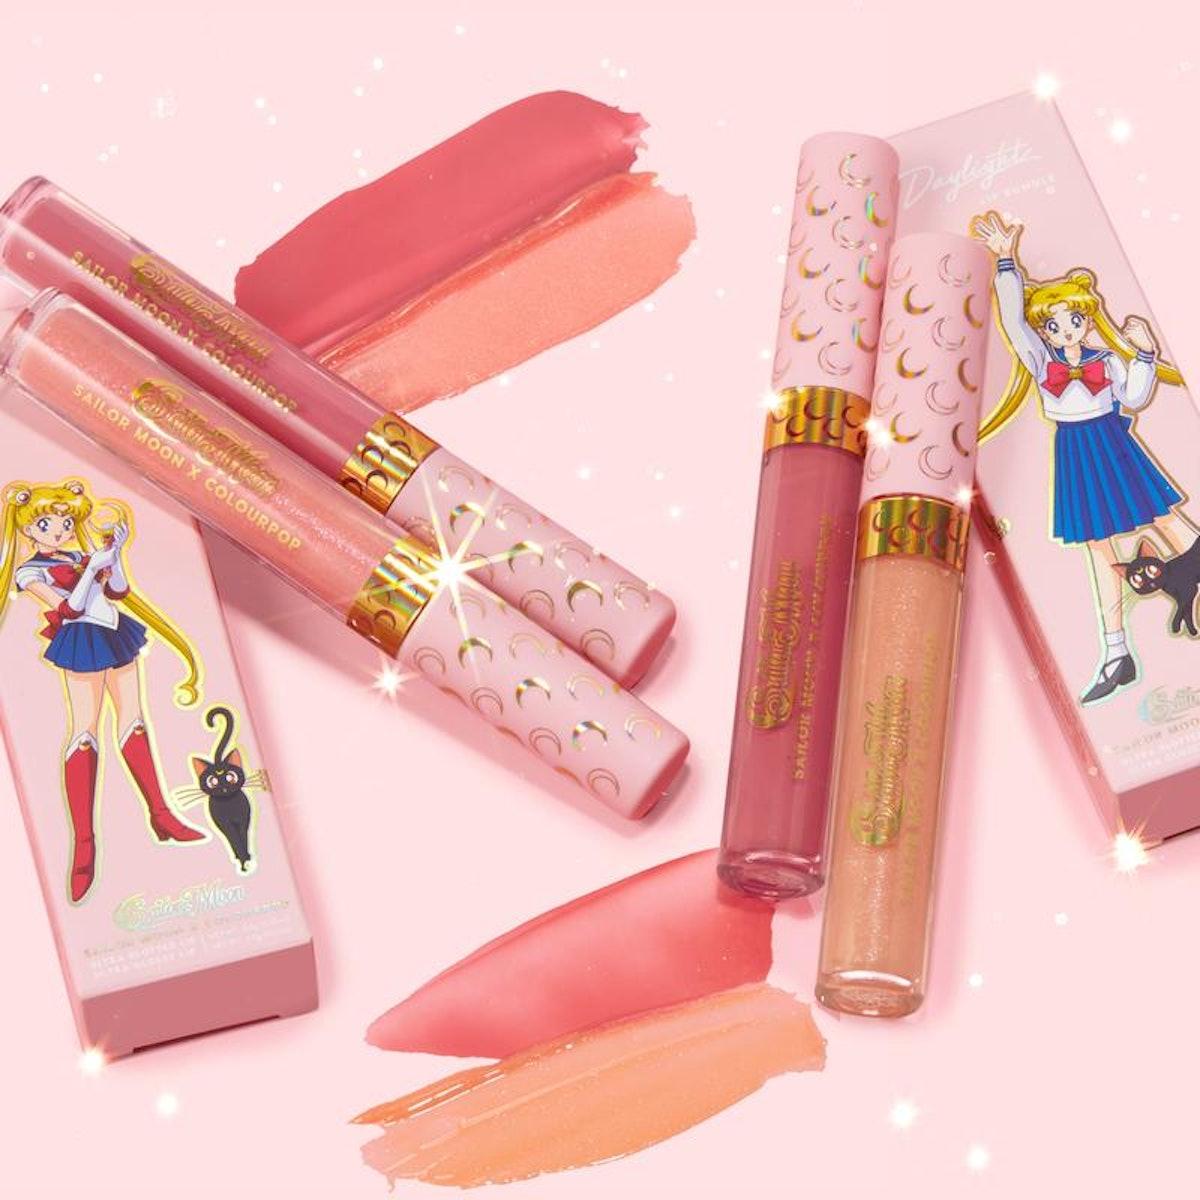 ColourPop x Sailor Moon Moonlight Lip Bundle